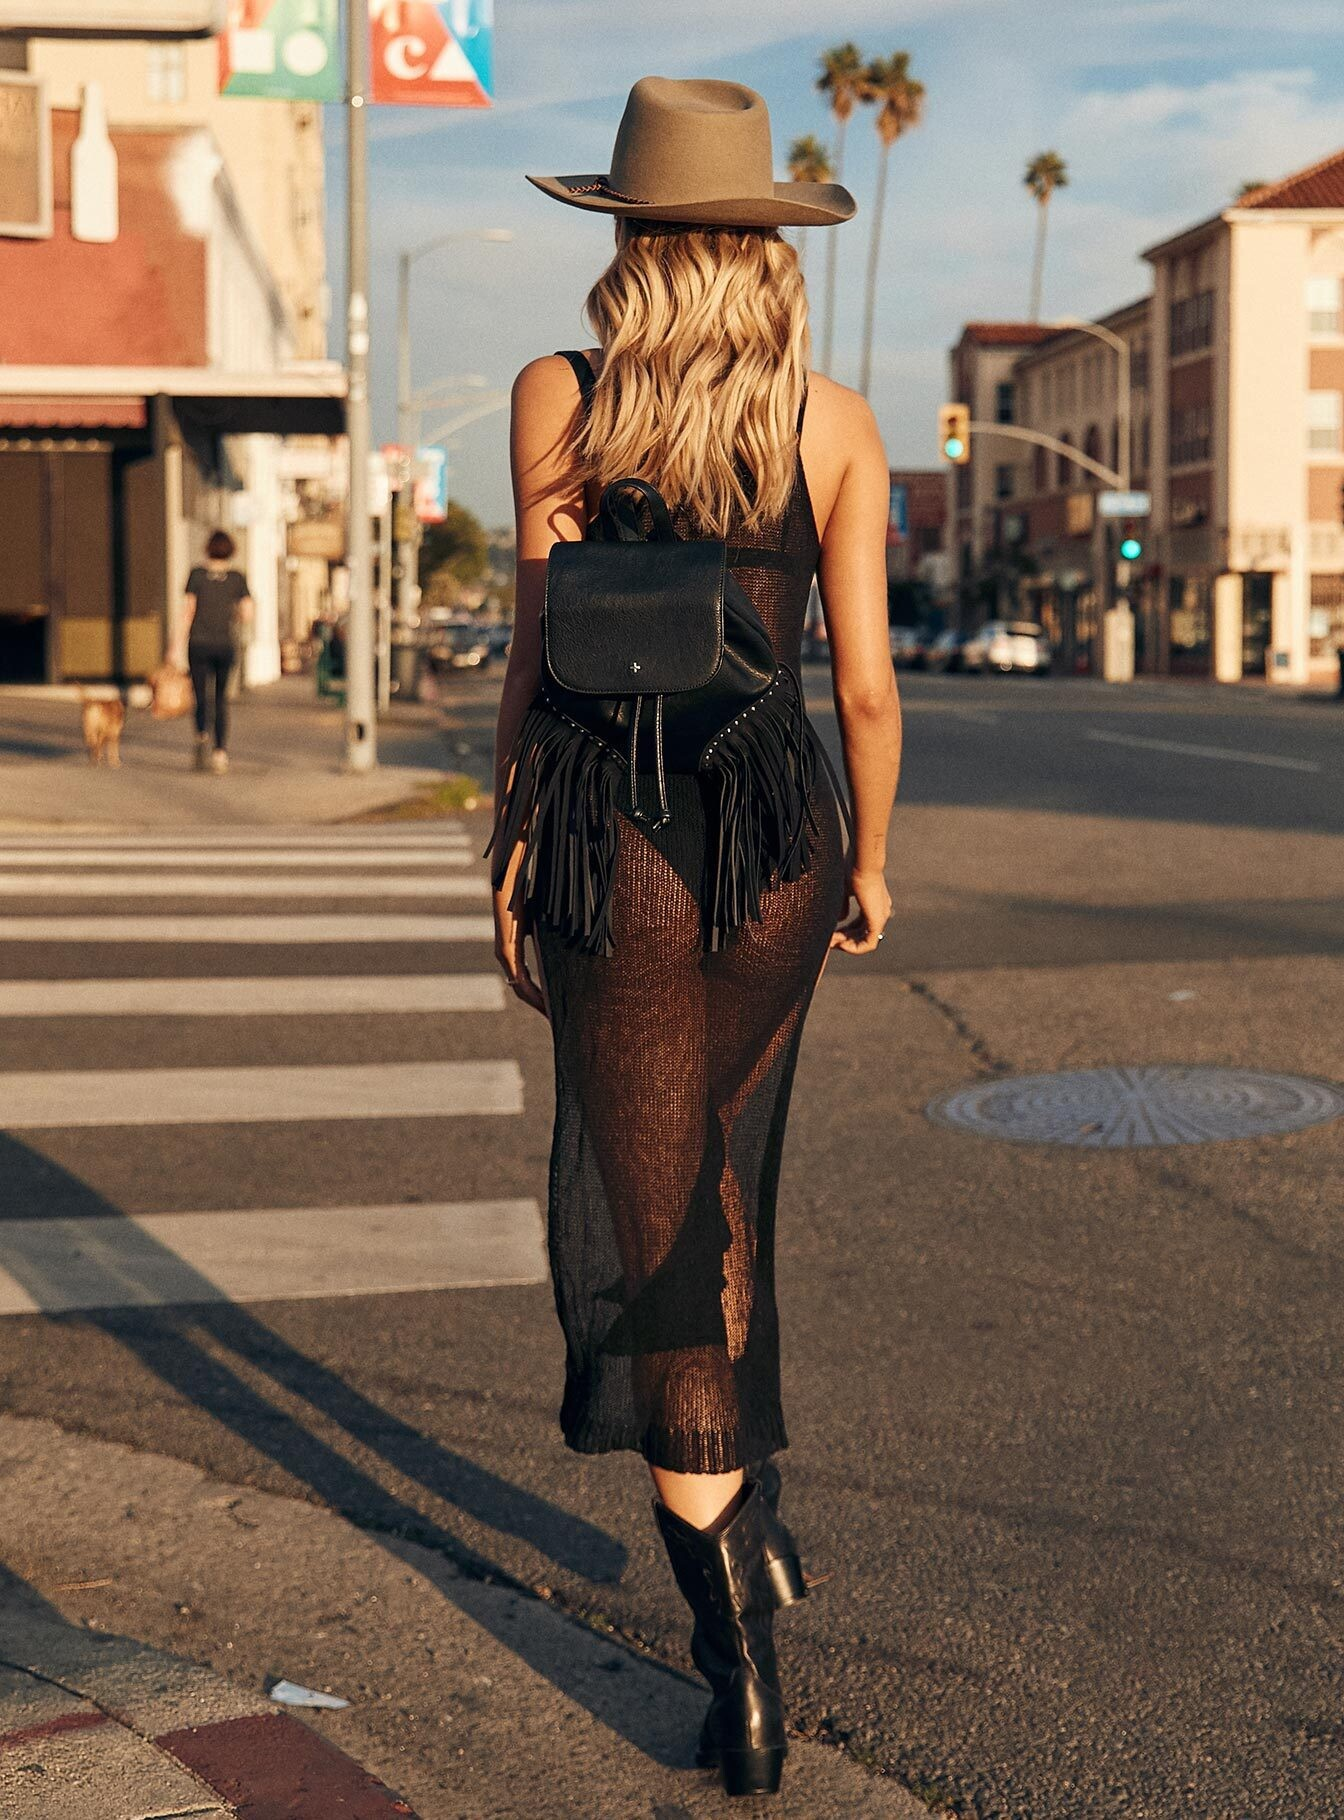 Josie Canseco Sexy Photoshoot